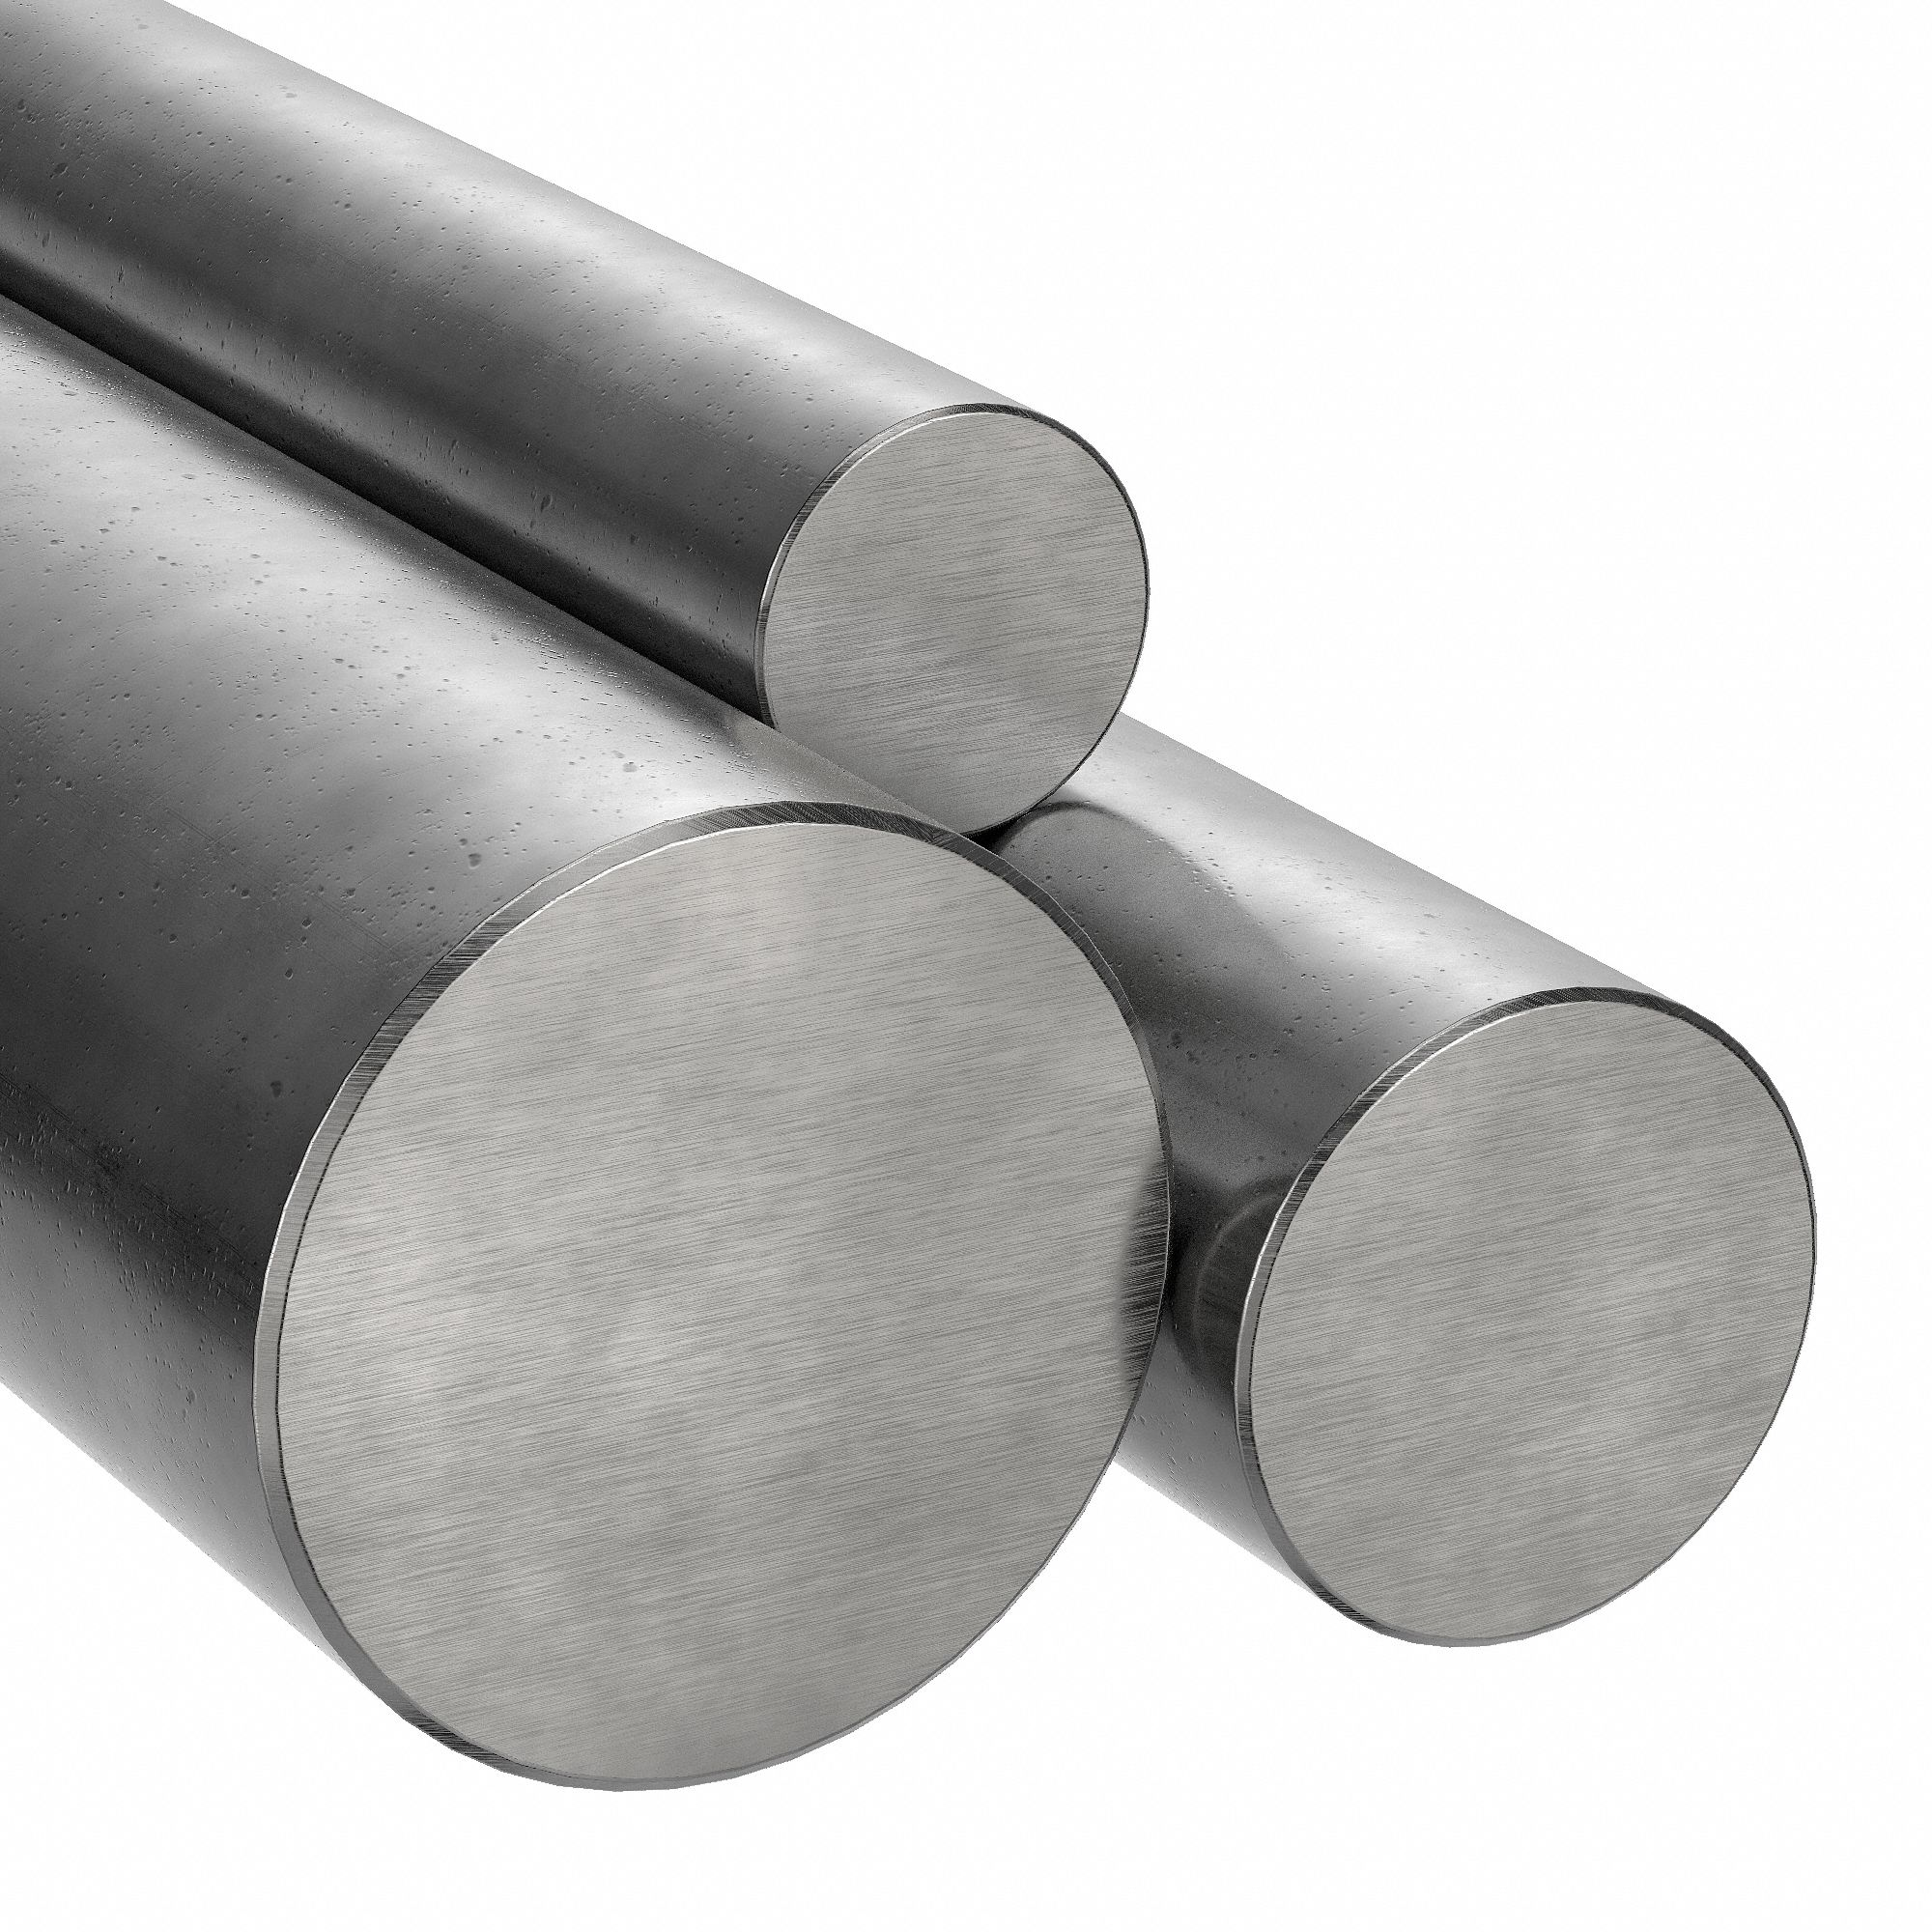 2HKF3 GRAINGER APPROVED Alloy Steel Flat,Steel,4140,1//2 x 1 In,1 Ft L